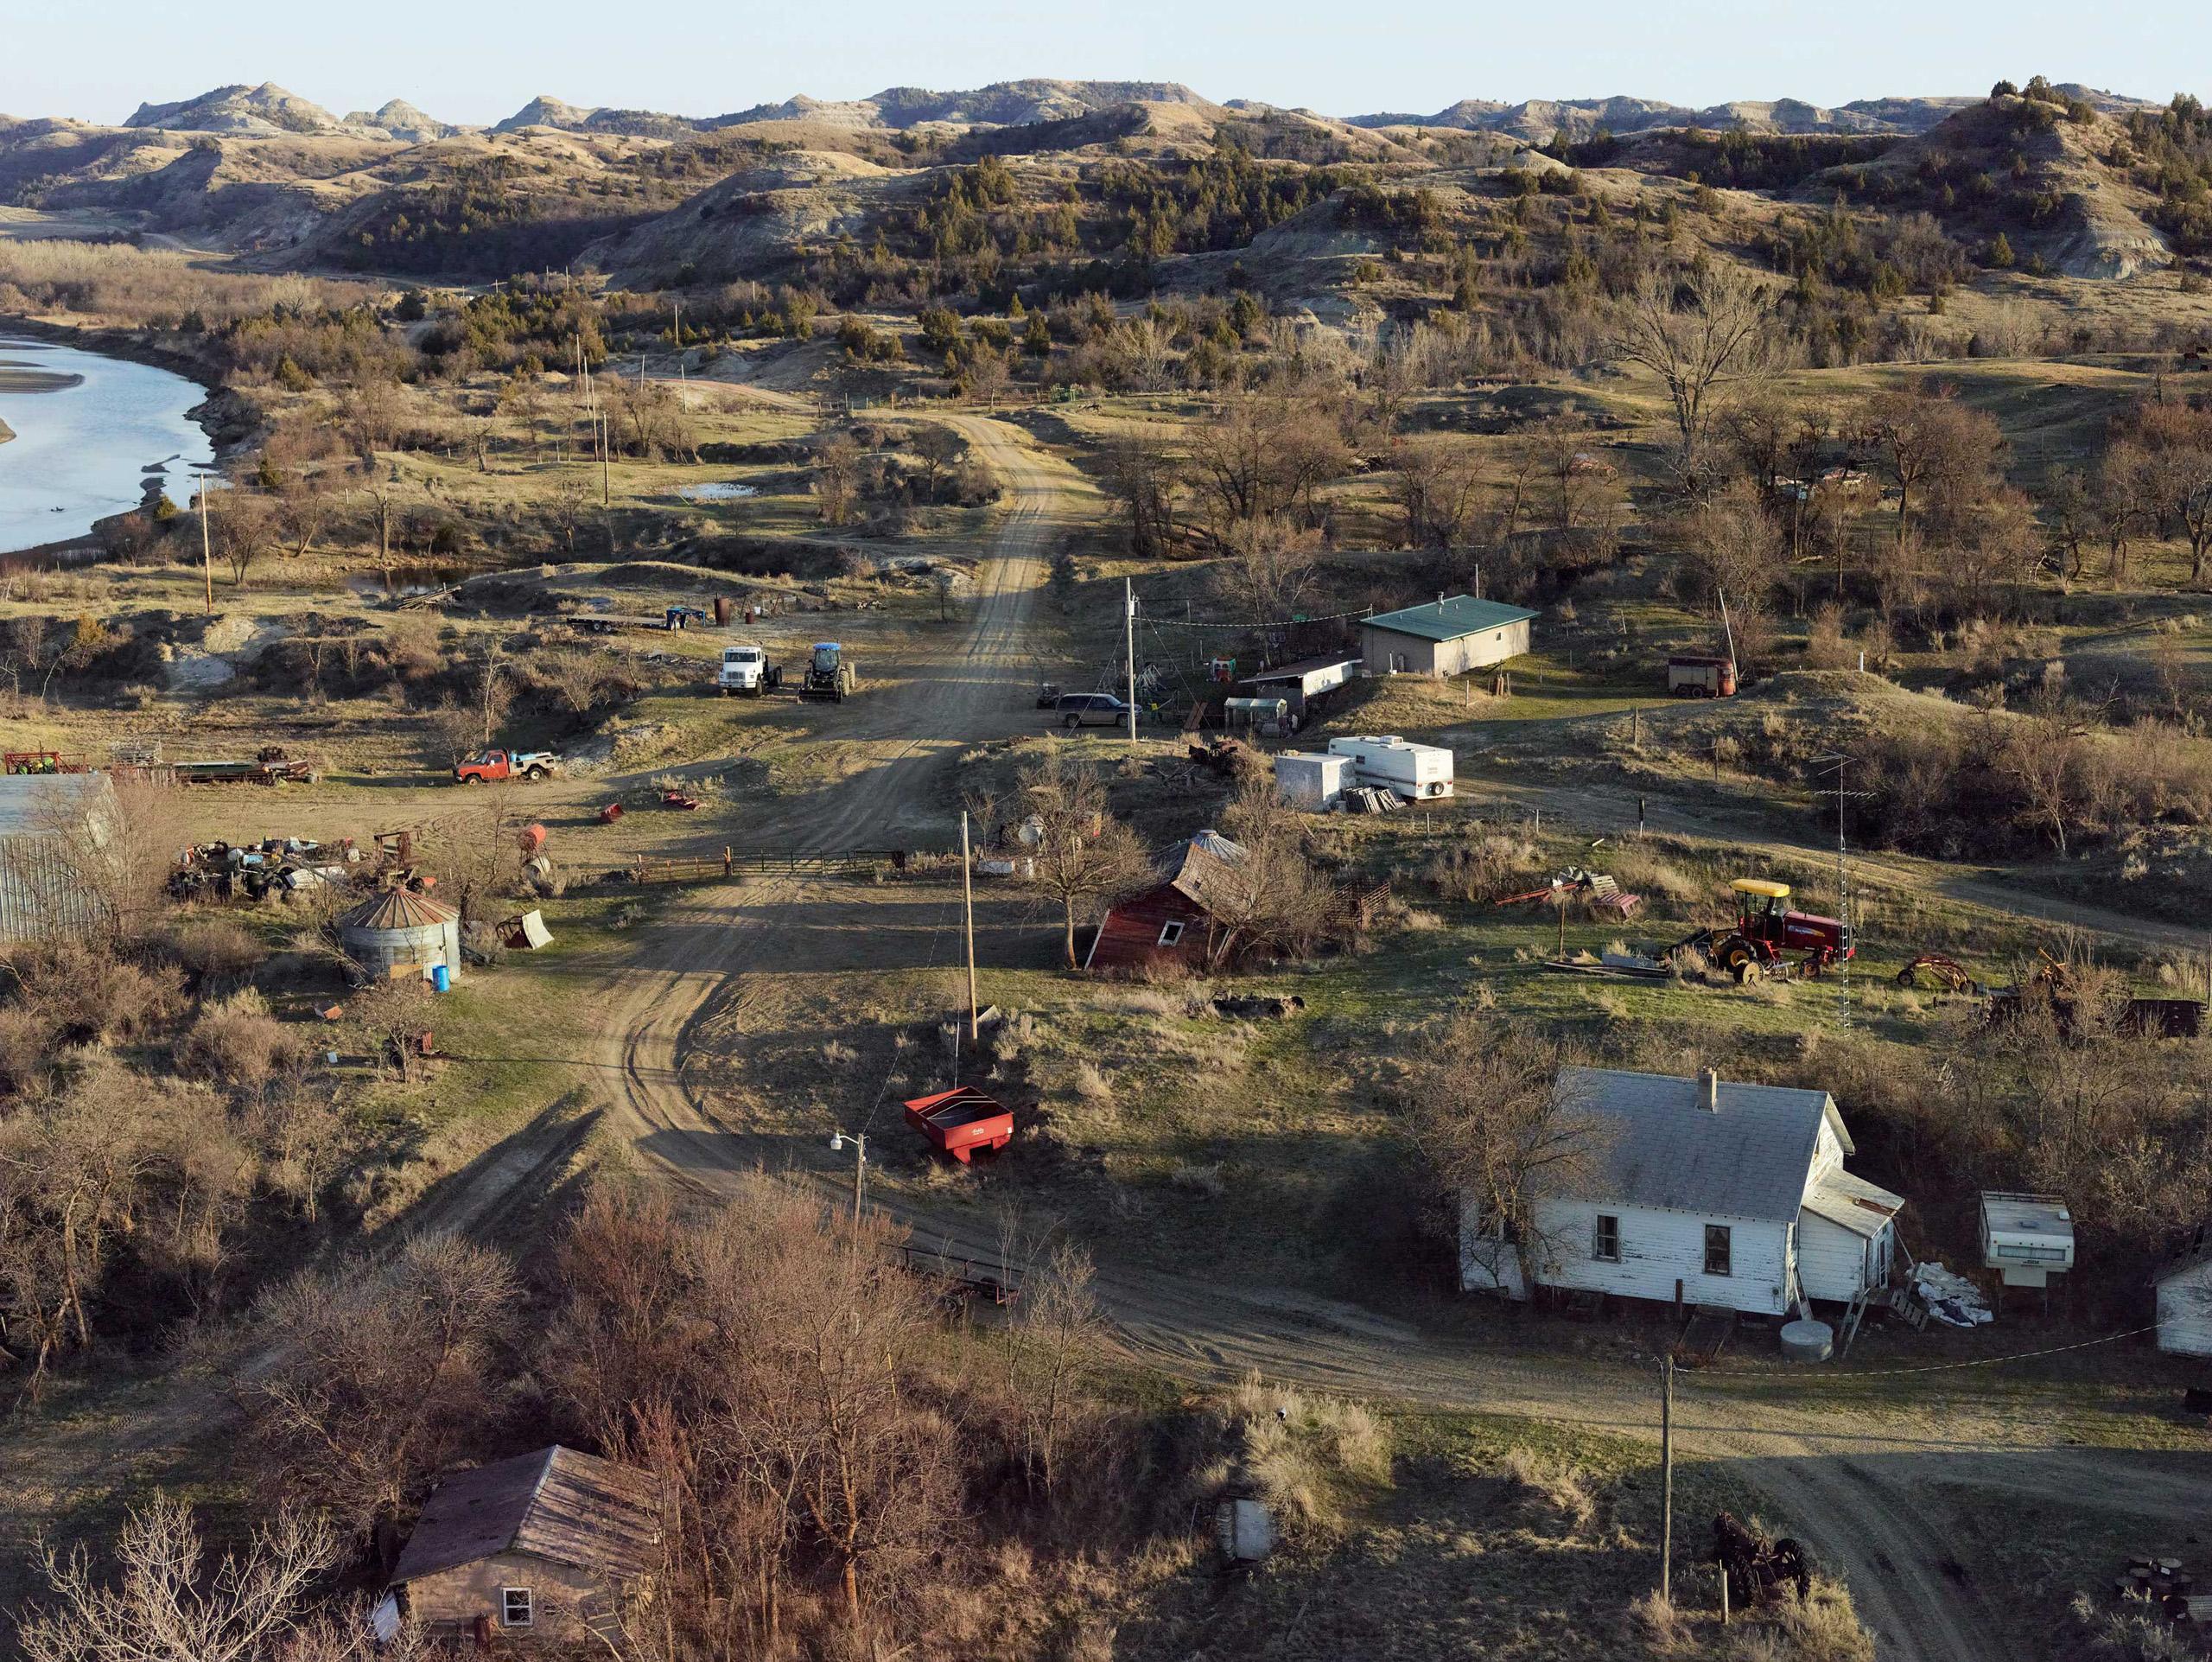 Along The Little Missouri. McKenzie County, North Dakota, 2013.